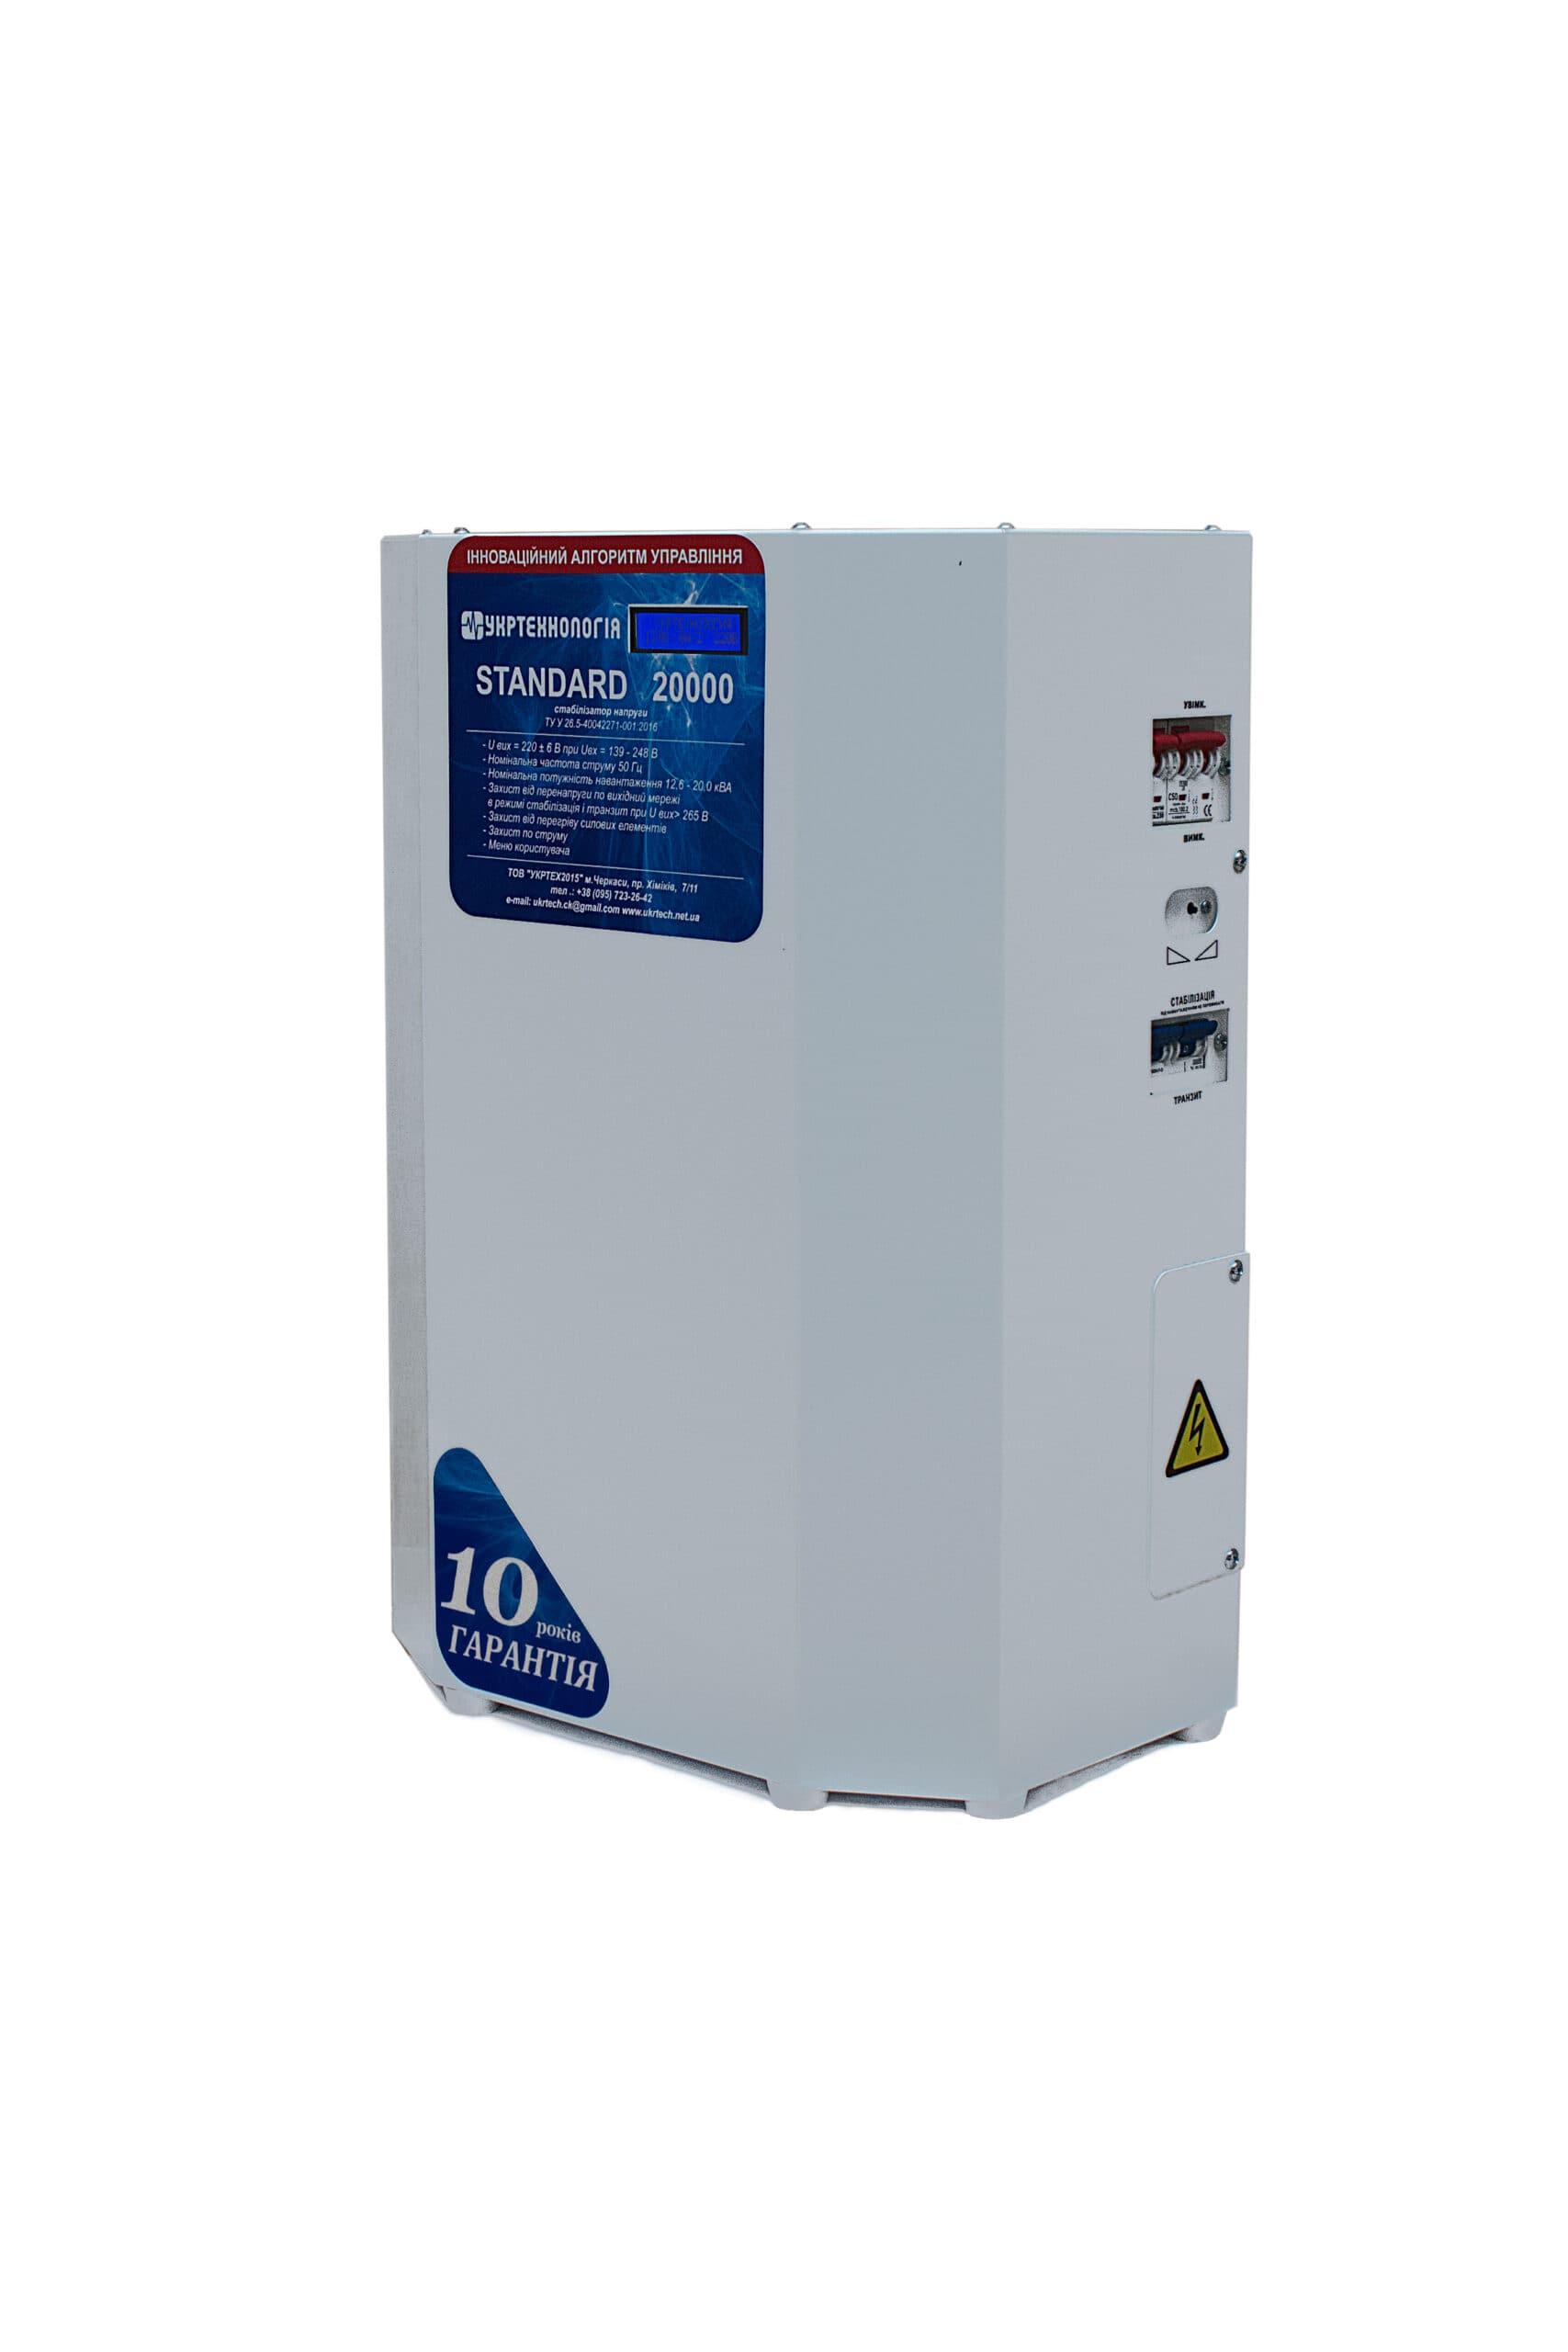 Стабилизаторы напряжения - Стабилизатор напряжения 20 кВт STANDARD  000001401 - Фото 1